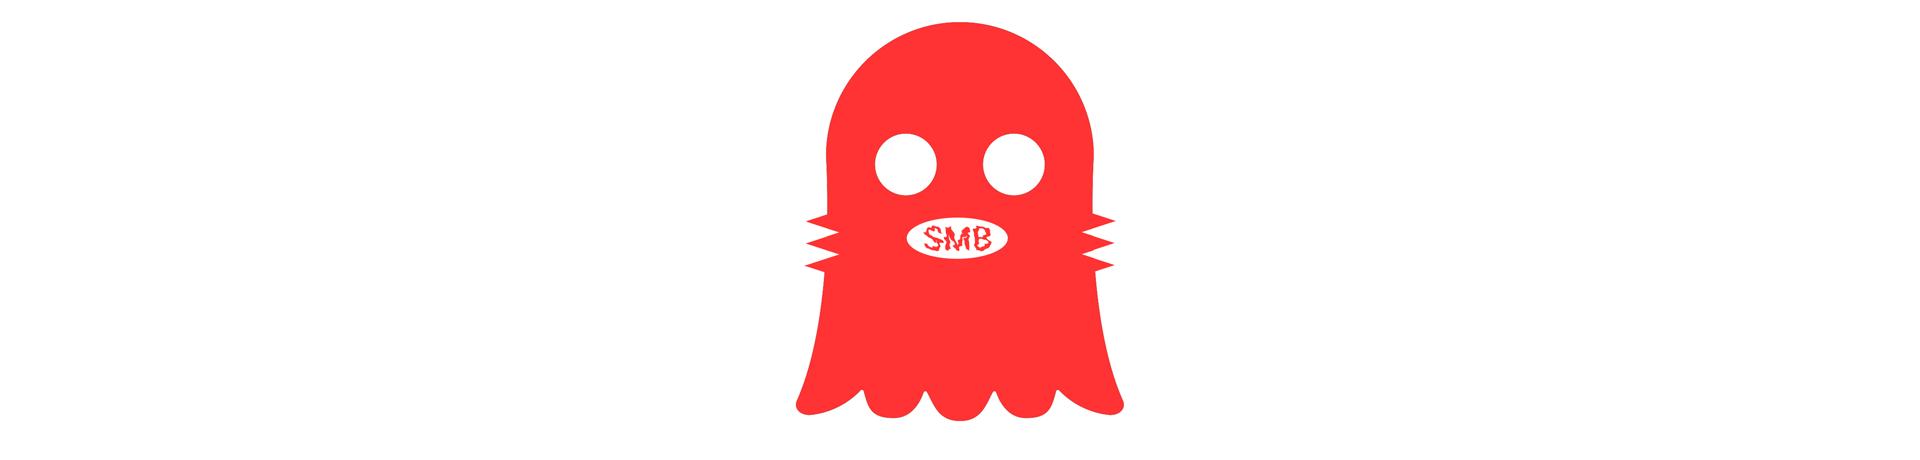 CVE-2020-0796 aka SMBGhost vulnerability